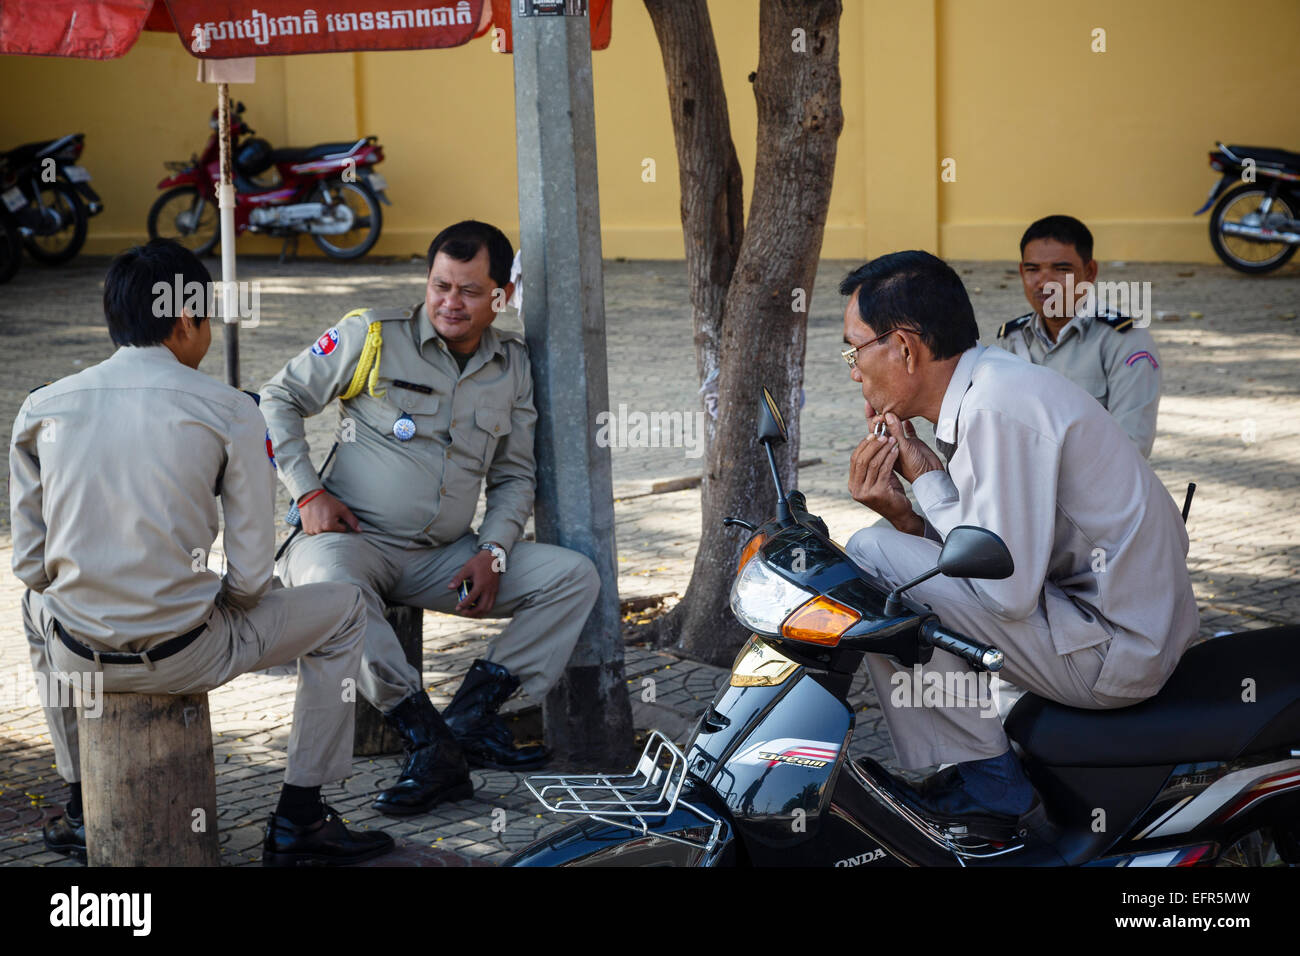 Police officers, Phnom Penh, Cambodia. - Stock Image